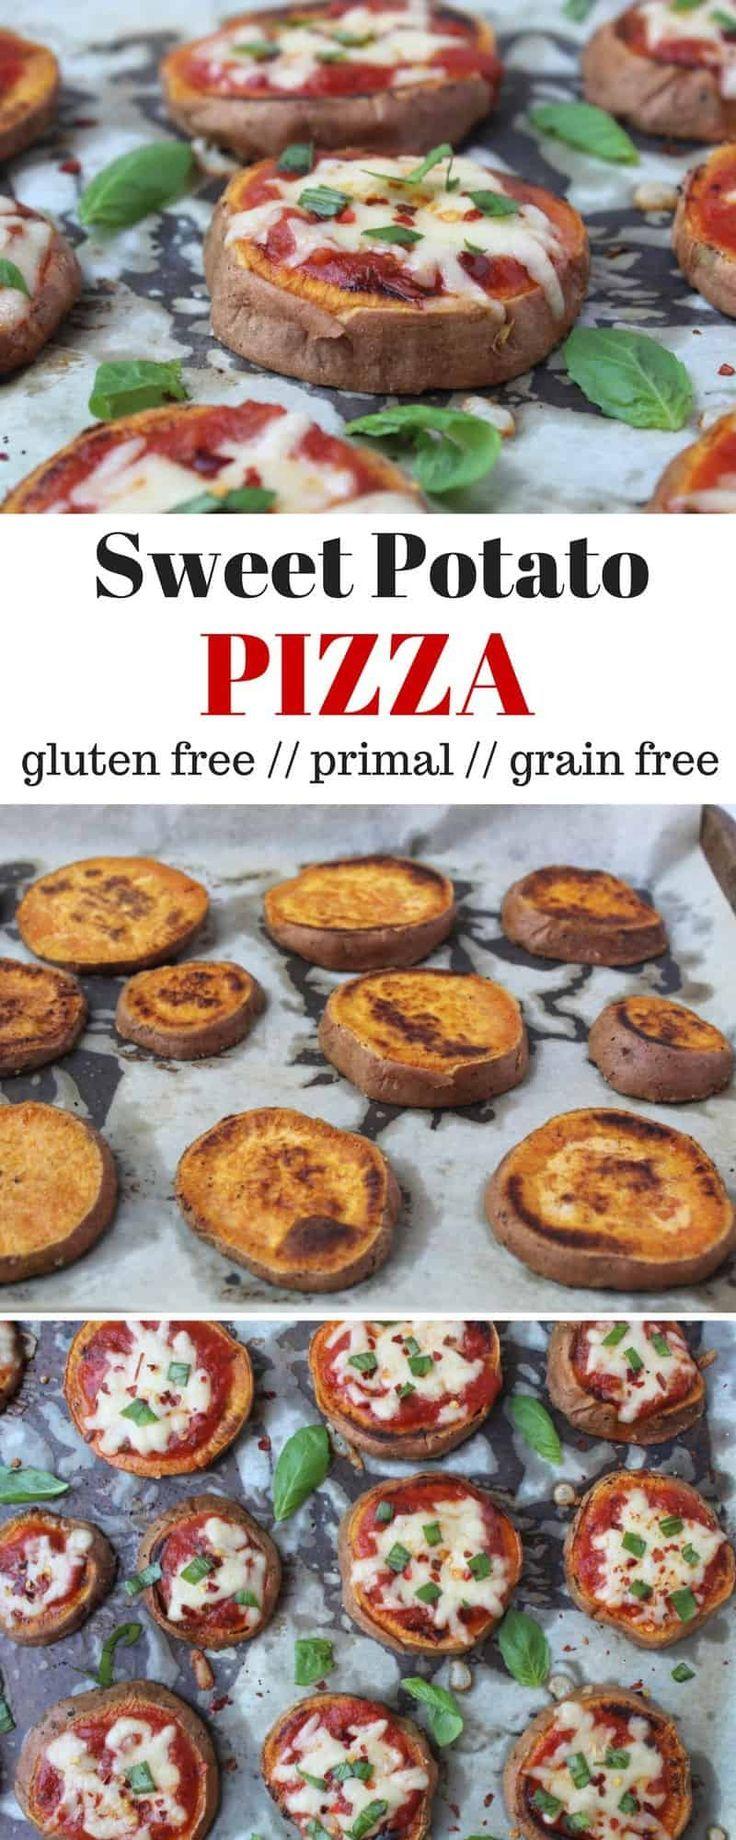 Sweet Potato Pizza images